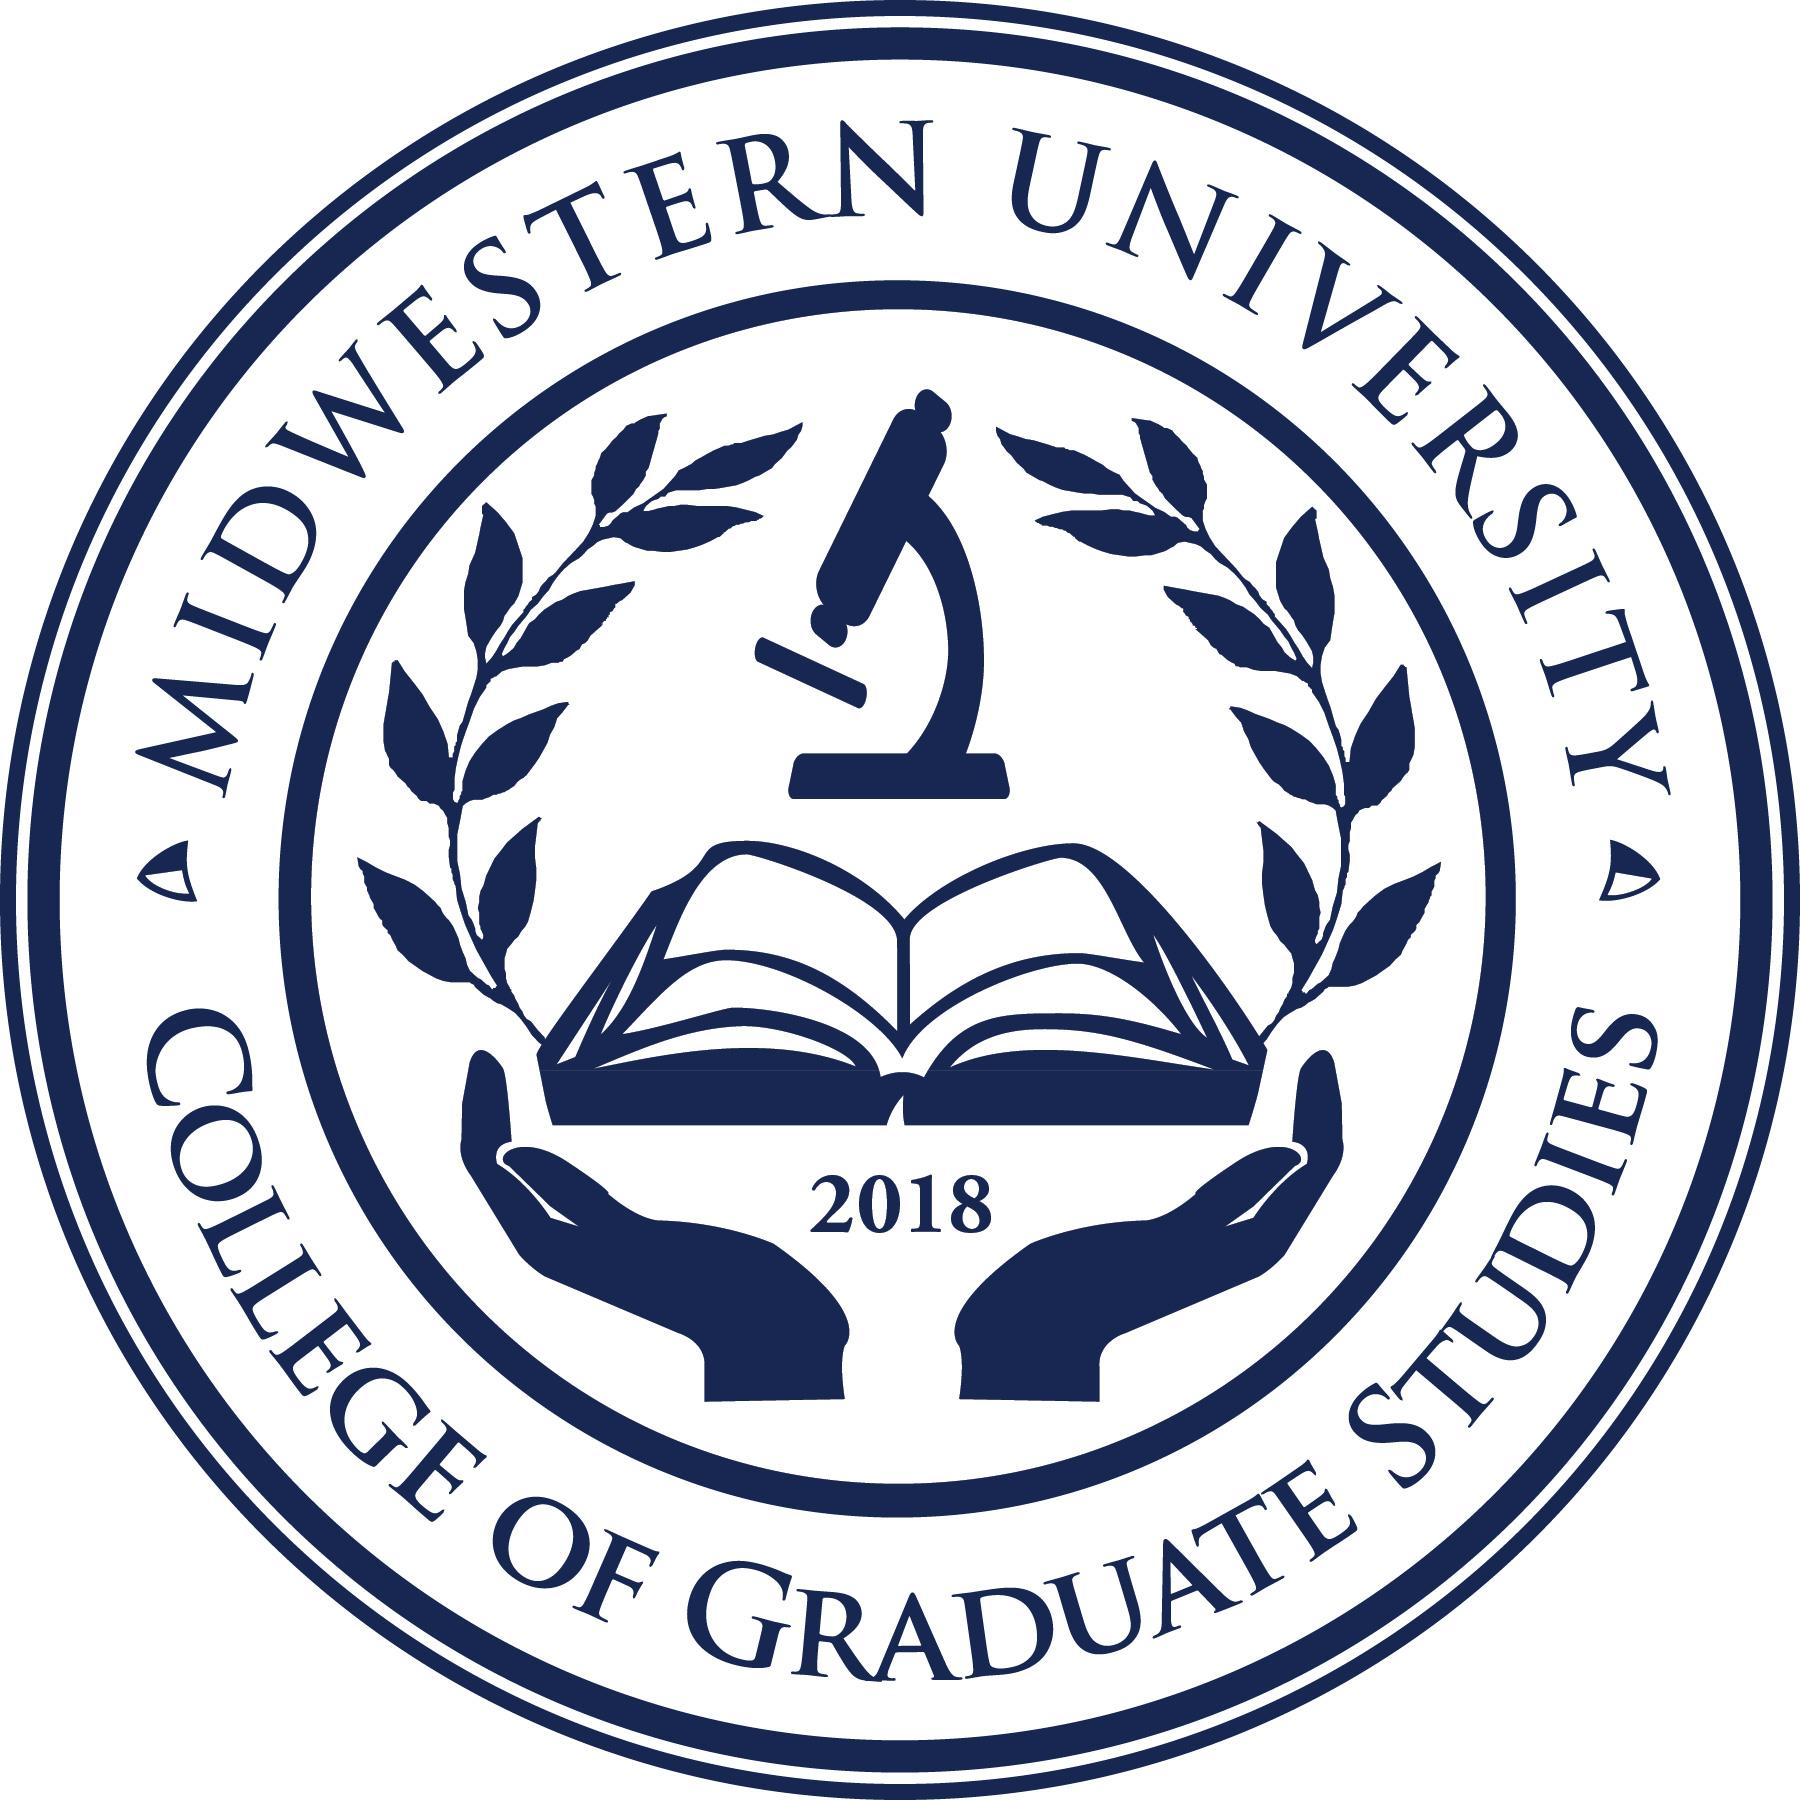 Midwestern University Glendale Az >> College Of Graduate Studies Added To Midwestern University